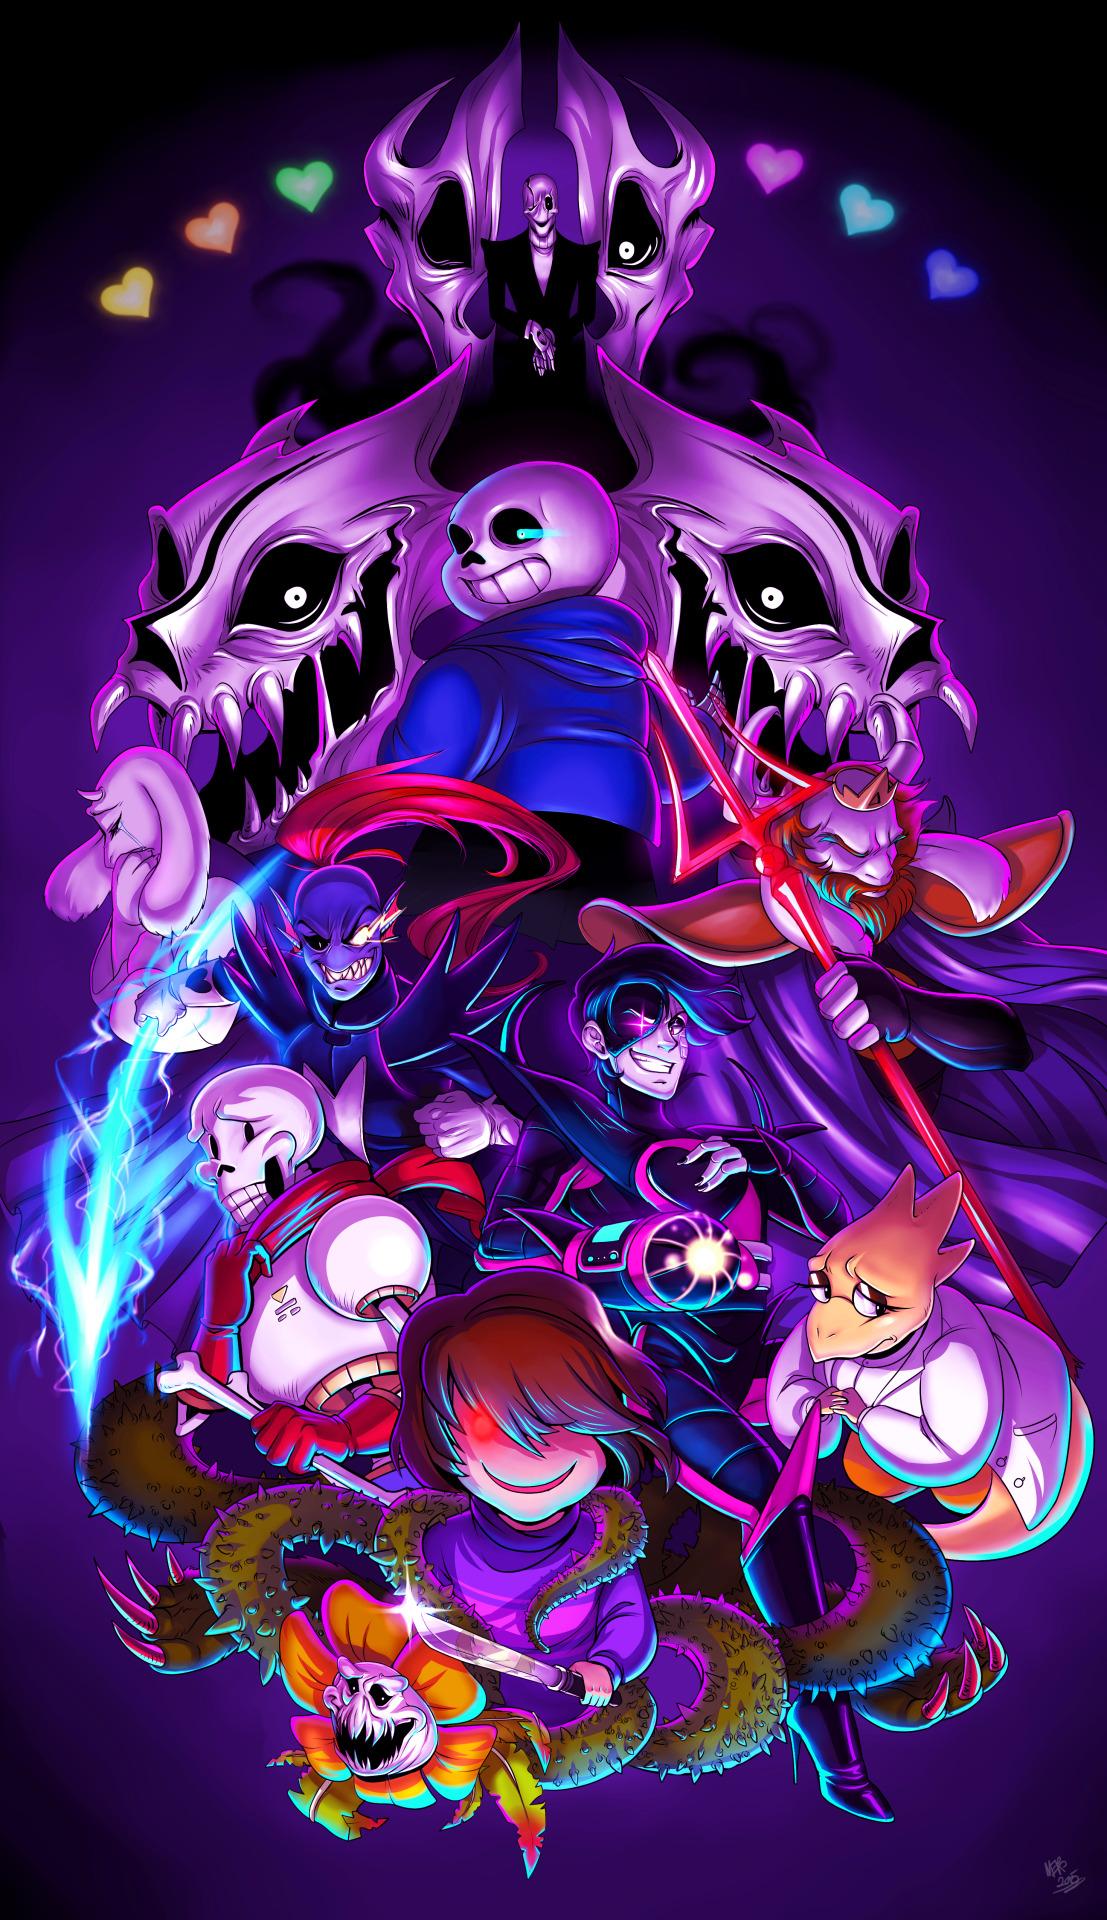 Undertale Image #2553858 - Zerochan Anime Image Board